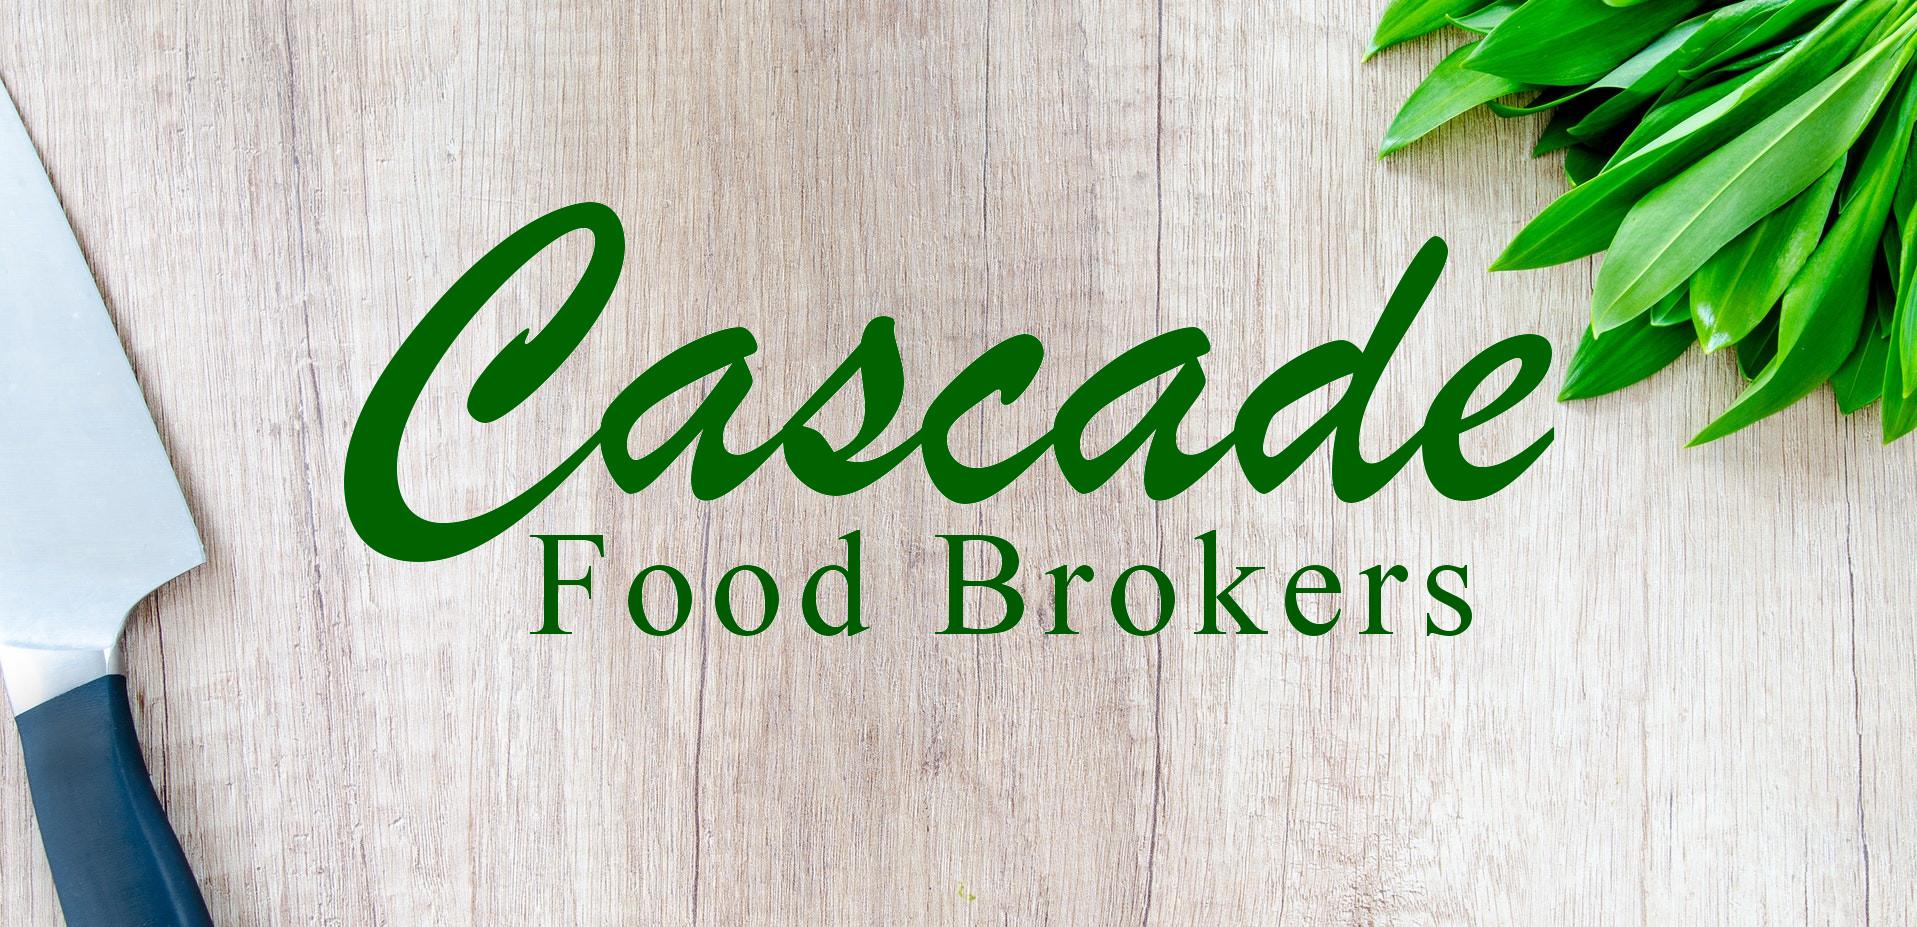 Cutting Board with cascadefoodbrokers logo